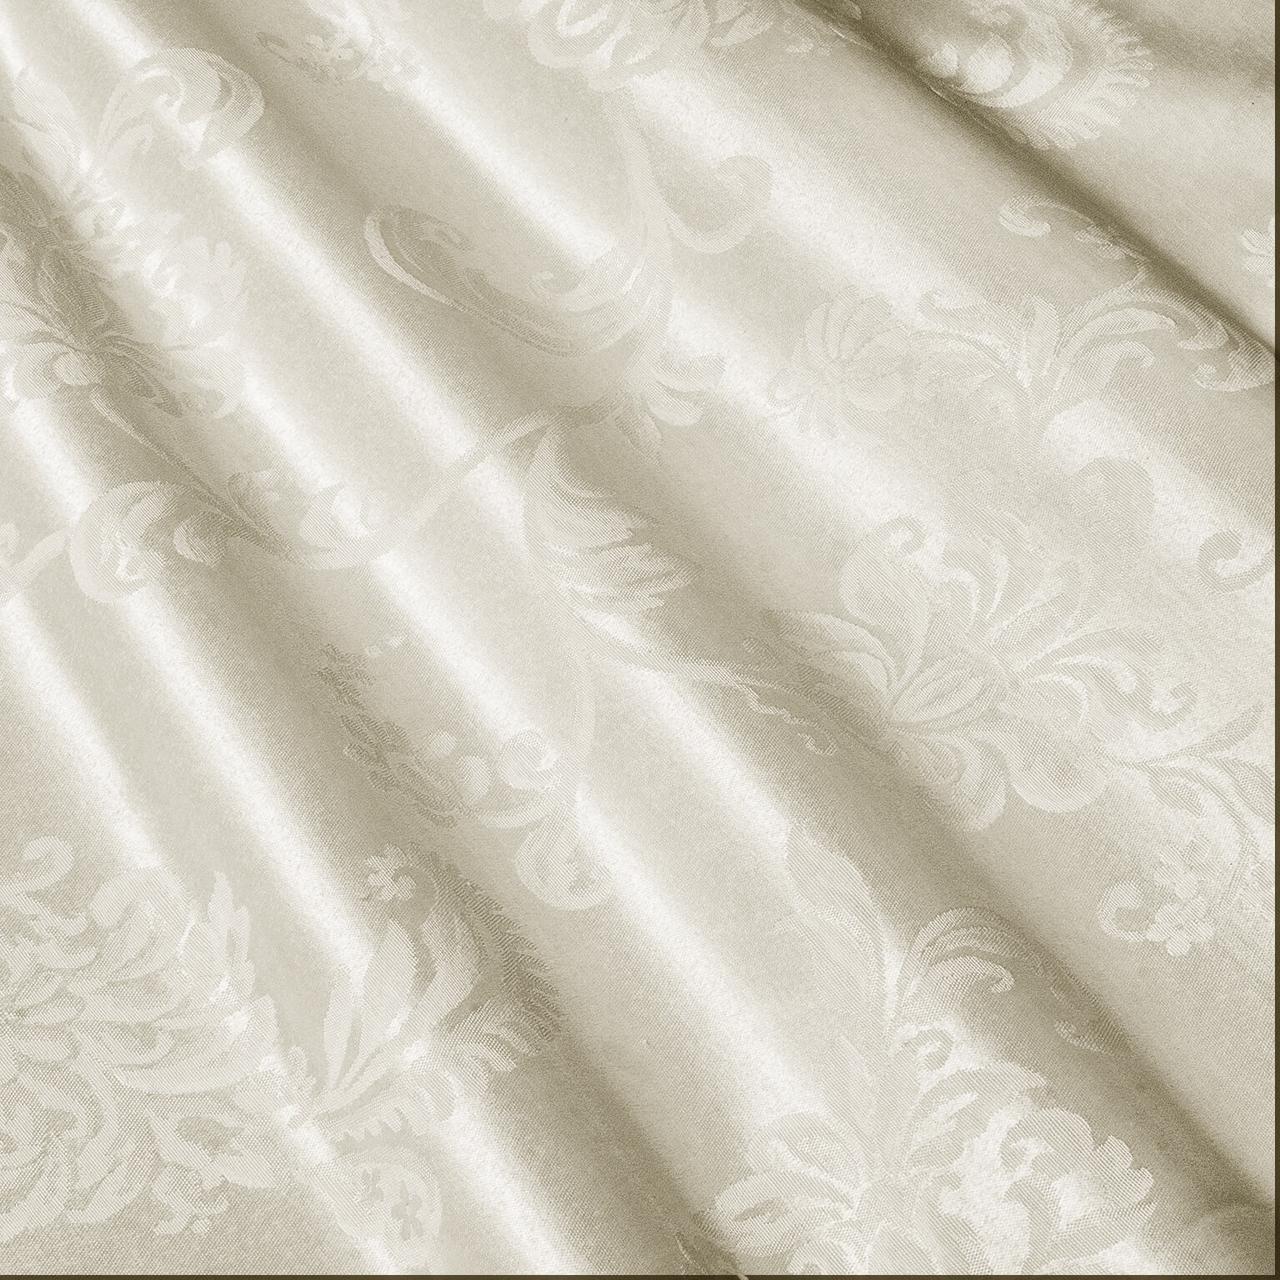 Ткань для скатертей и салфеток (ресторан) 400109 v 3